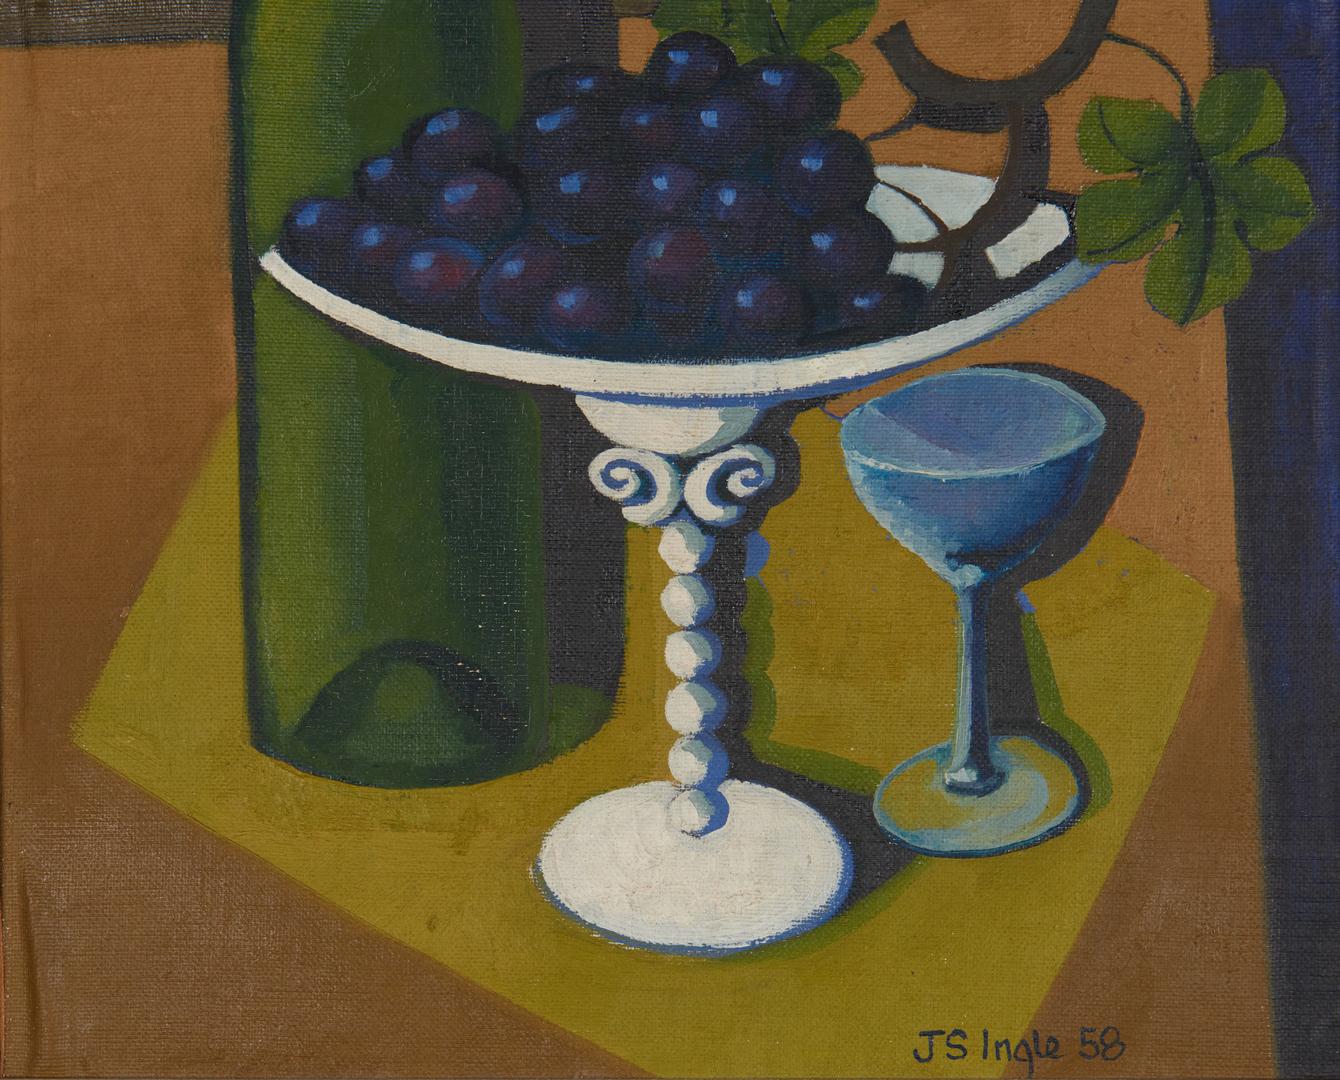 Lot 556: John Stuart Ingle O/B, Abstract Still Life